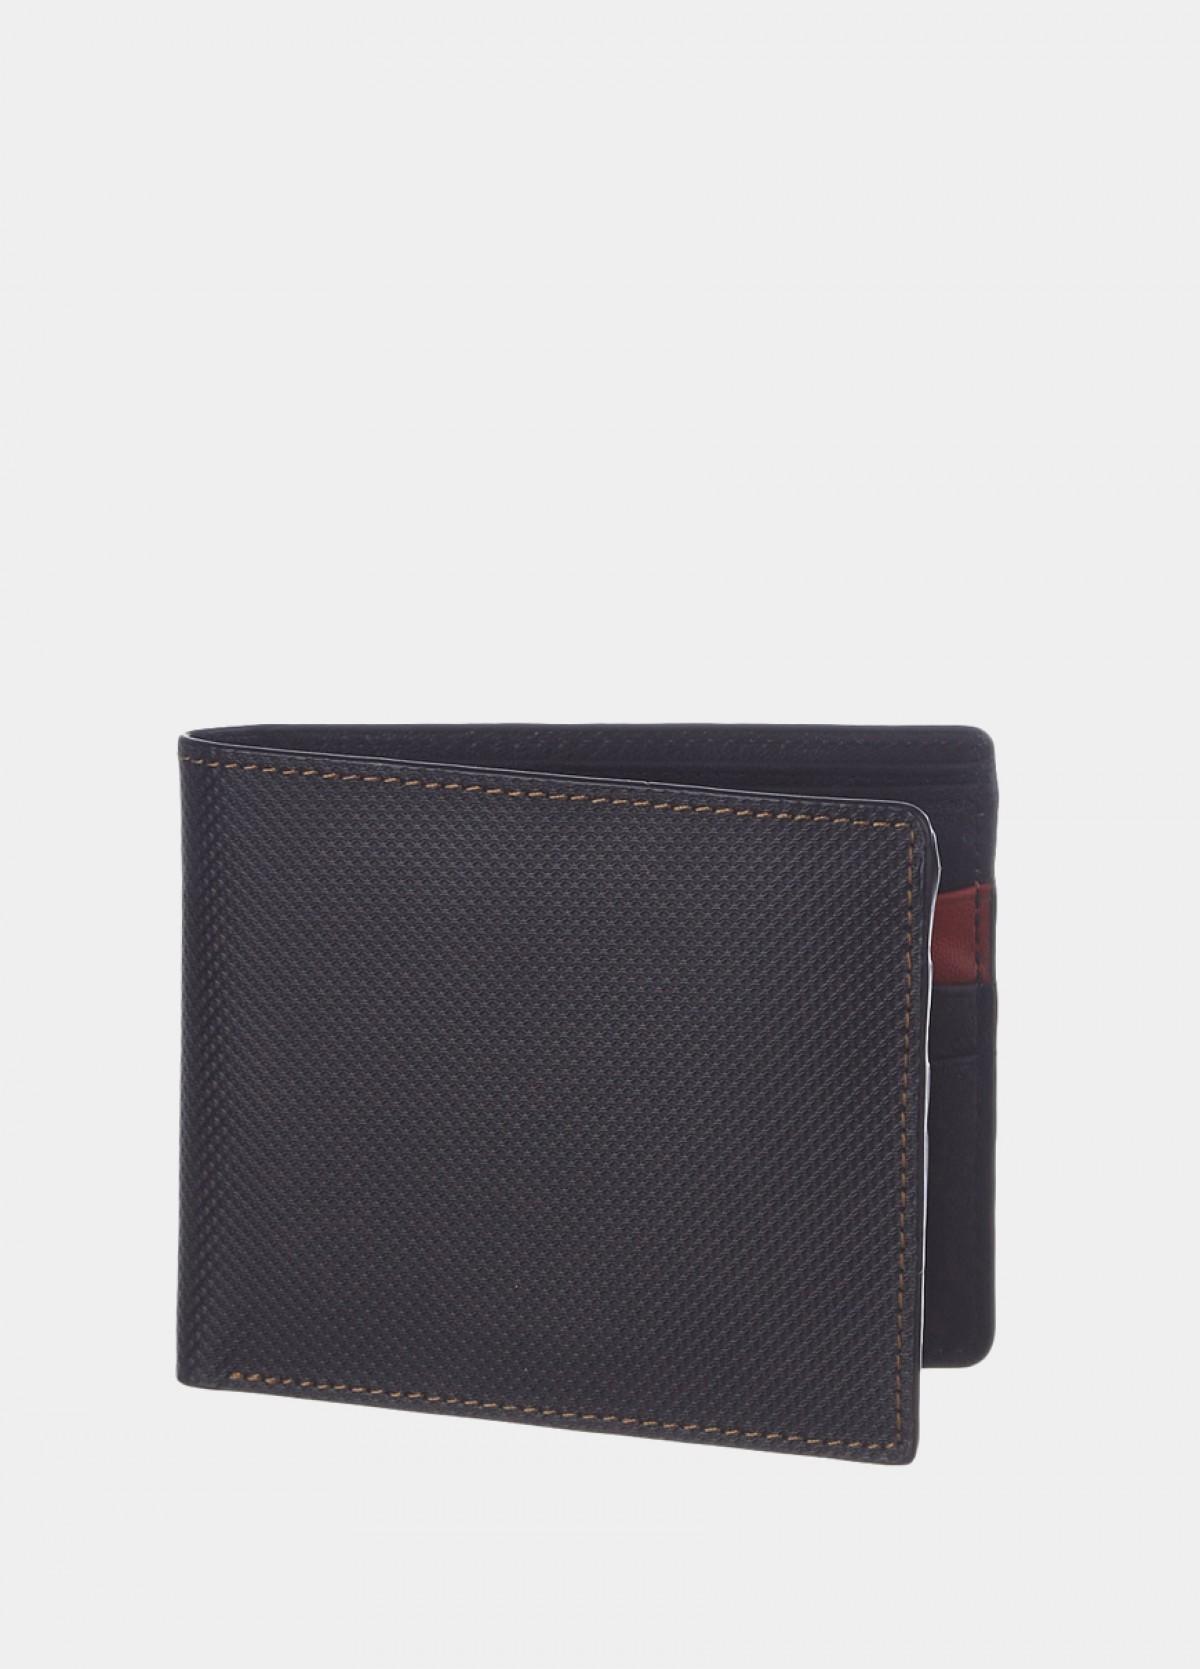 The Black Bi-Fold Wallet